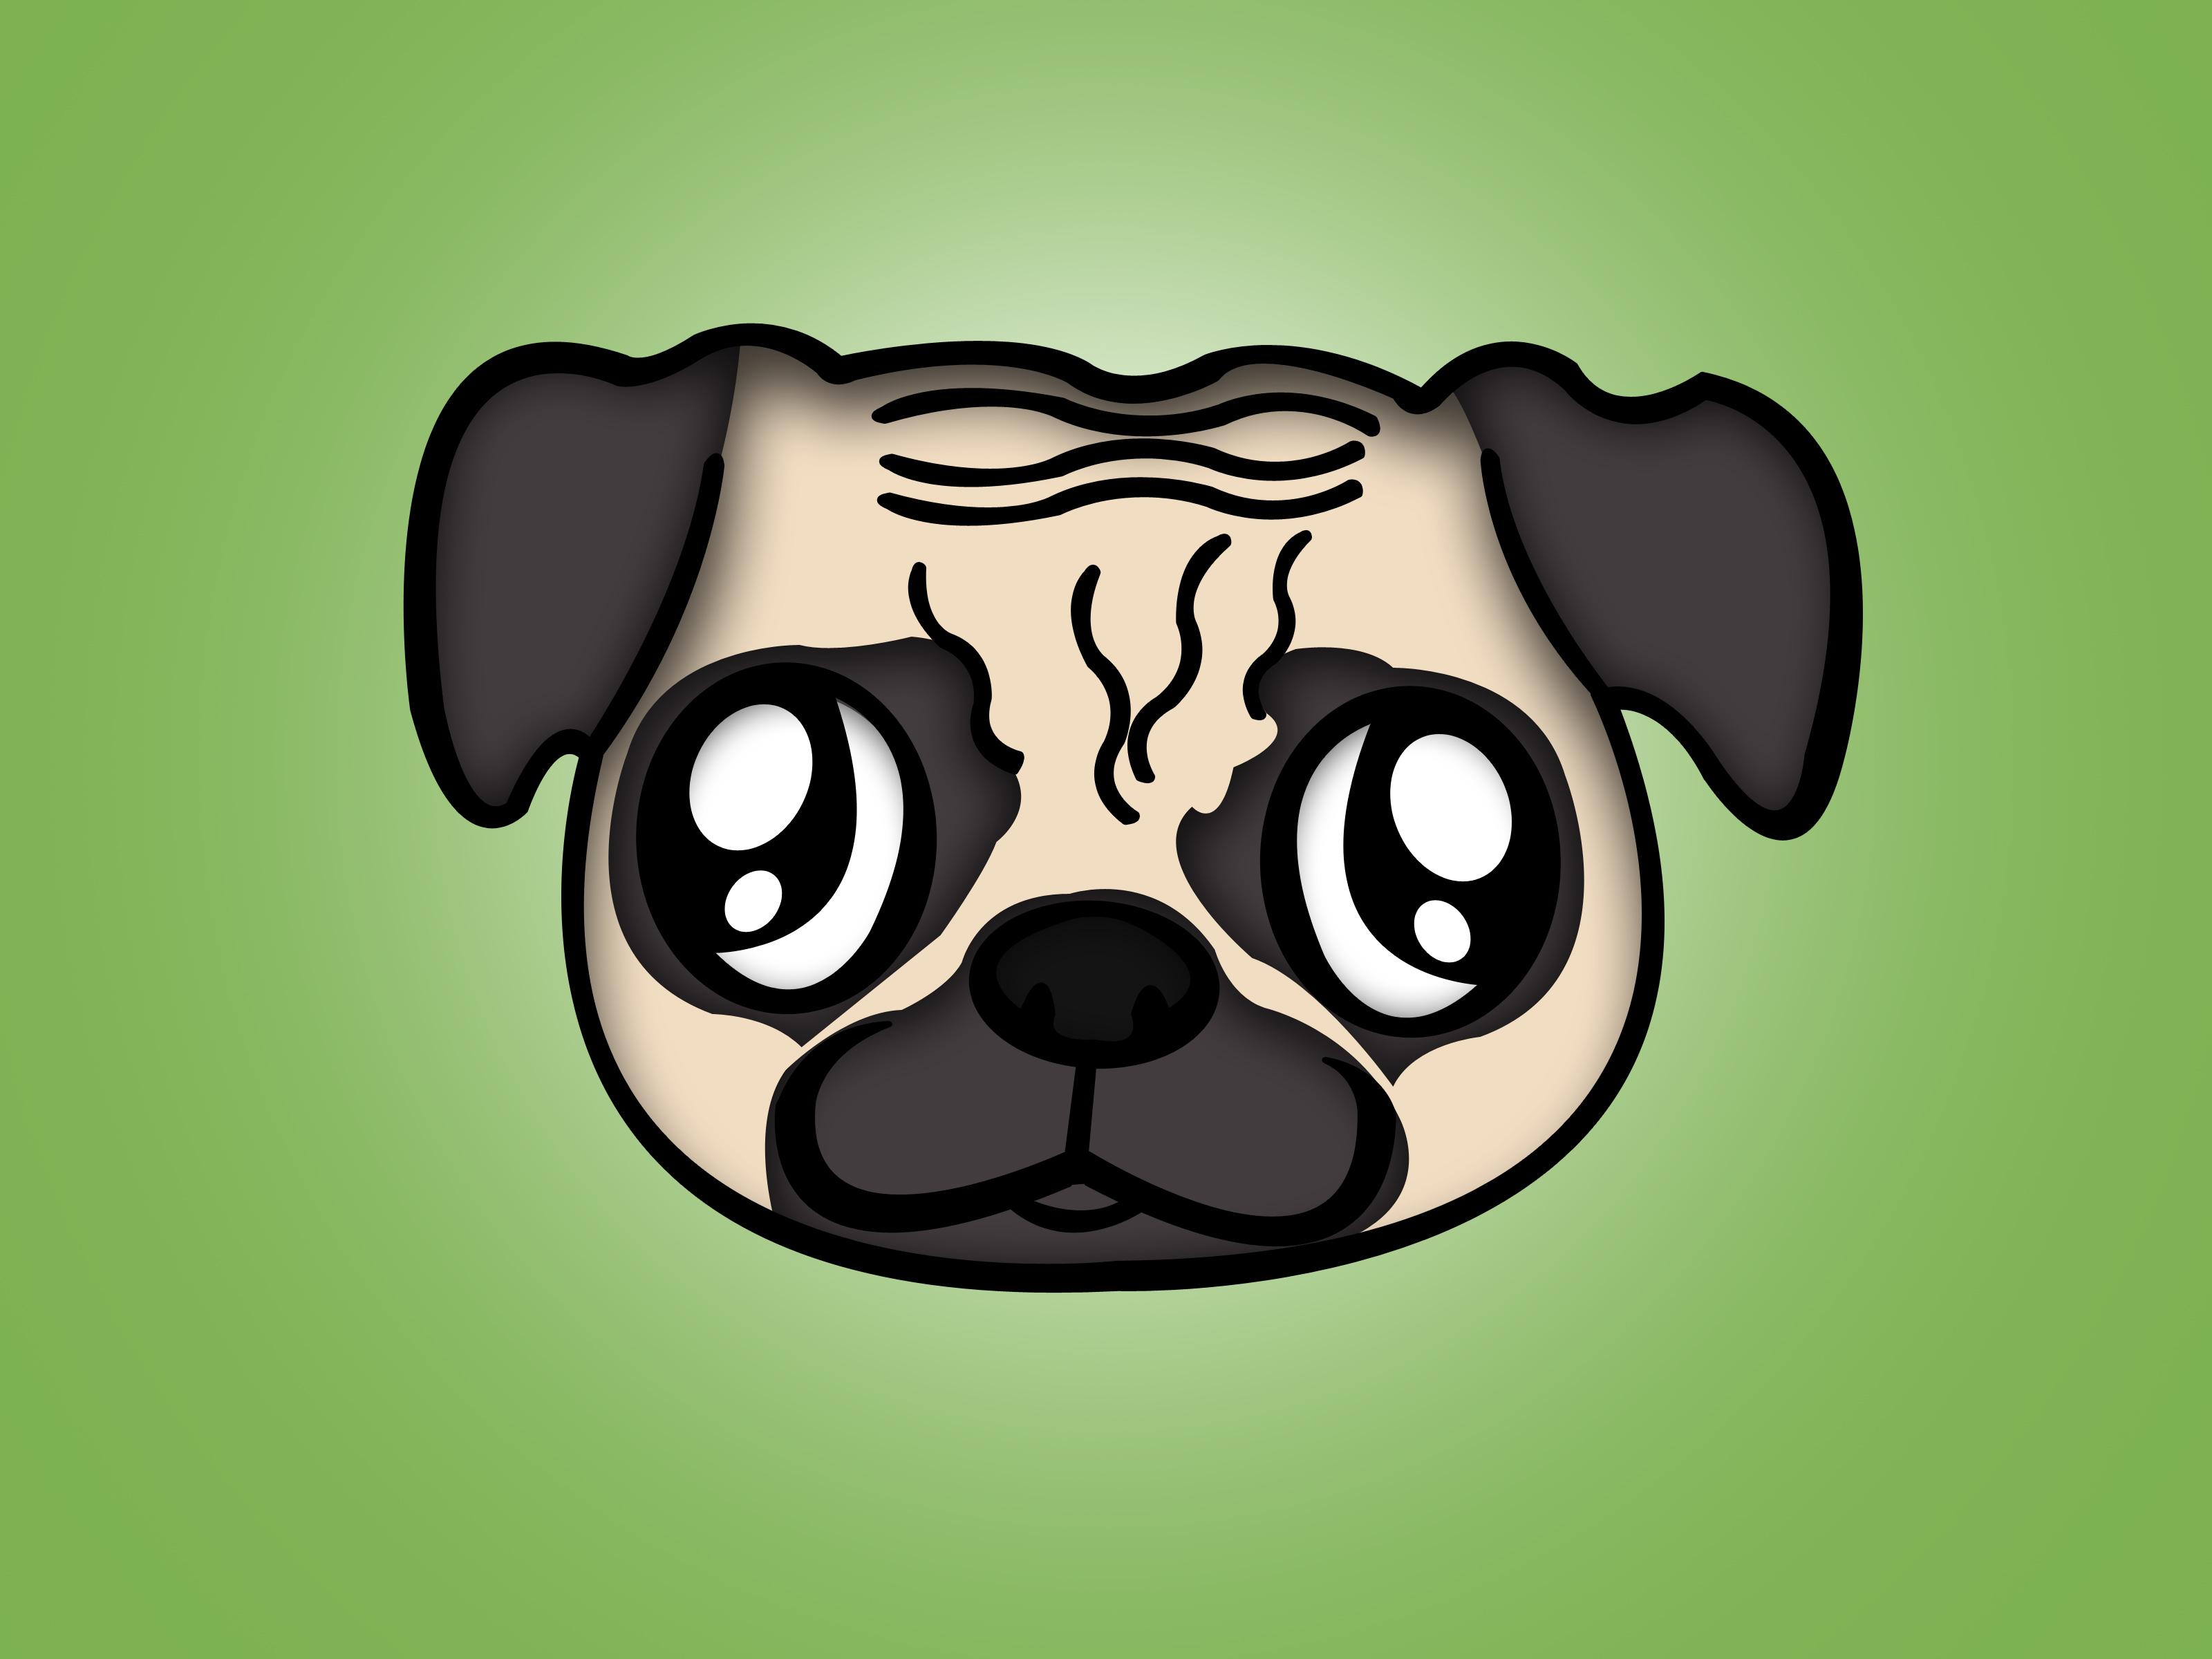 Drawn pug Pug: Steps Draw to How